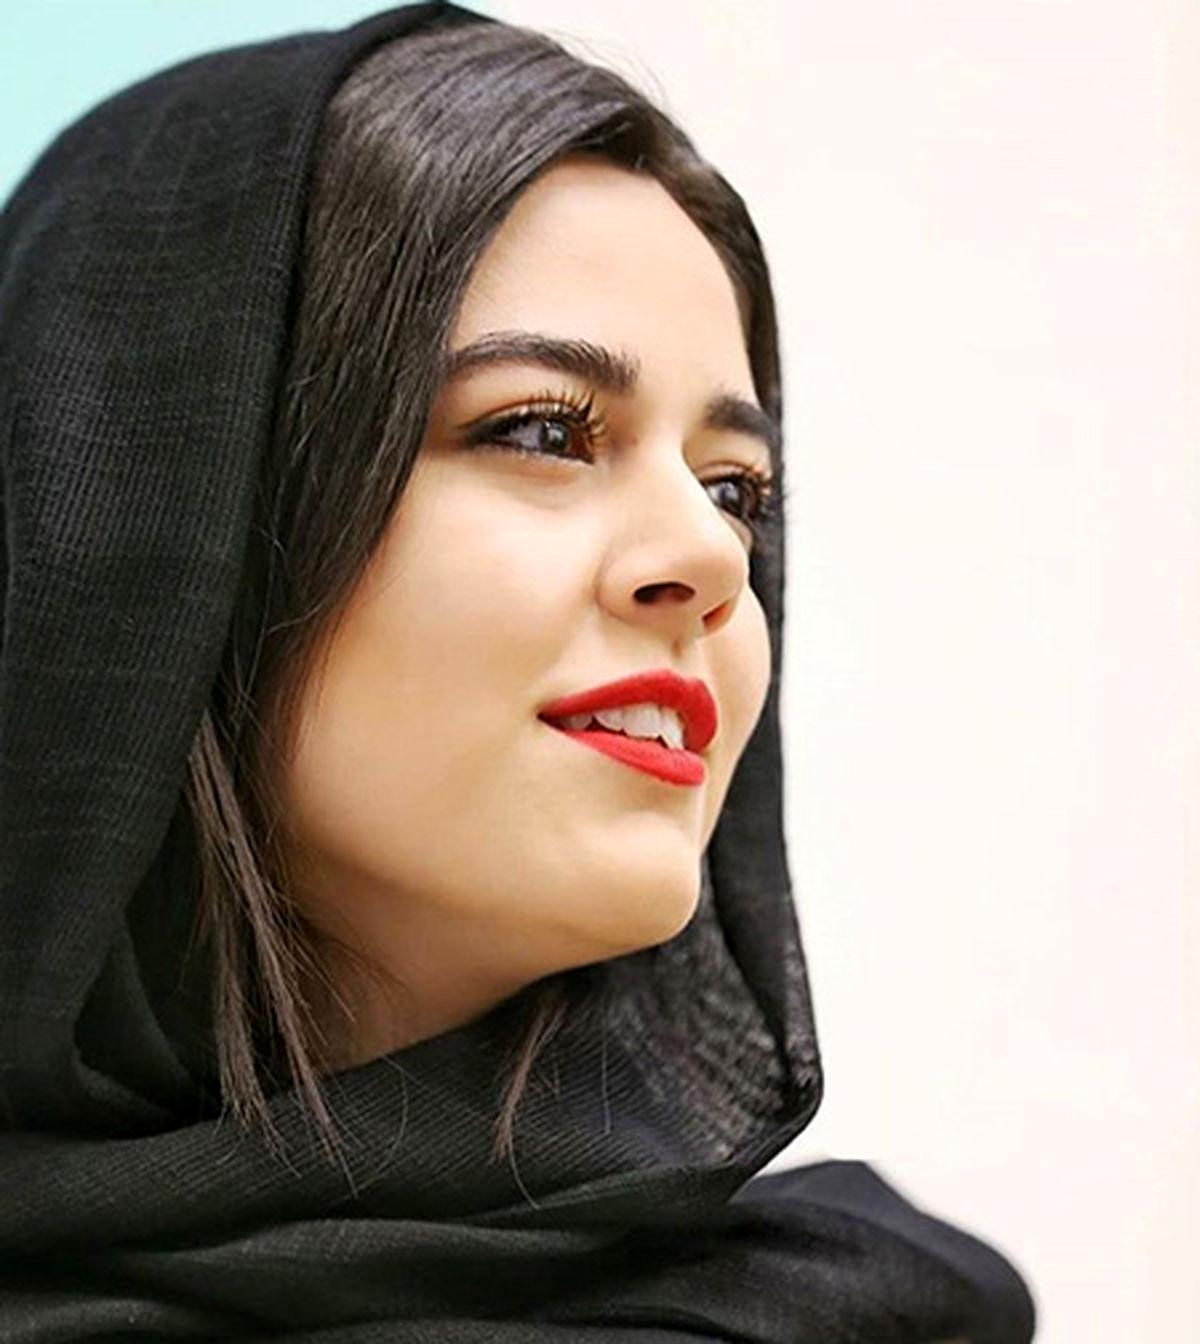 ماهور الوند   لباس باز در لب ساحل جنجالی شد + عکس لورفته